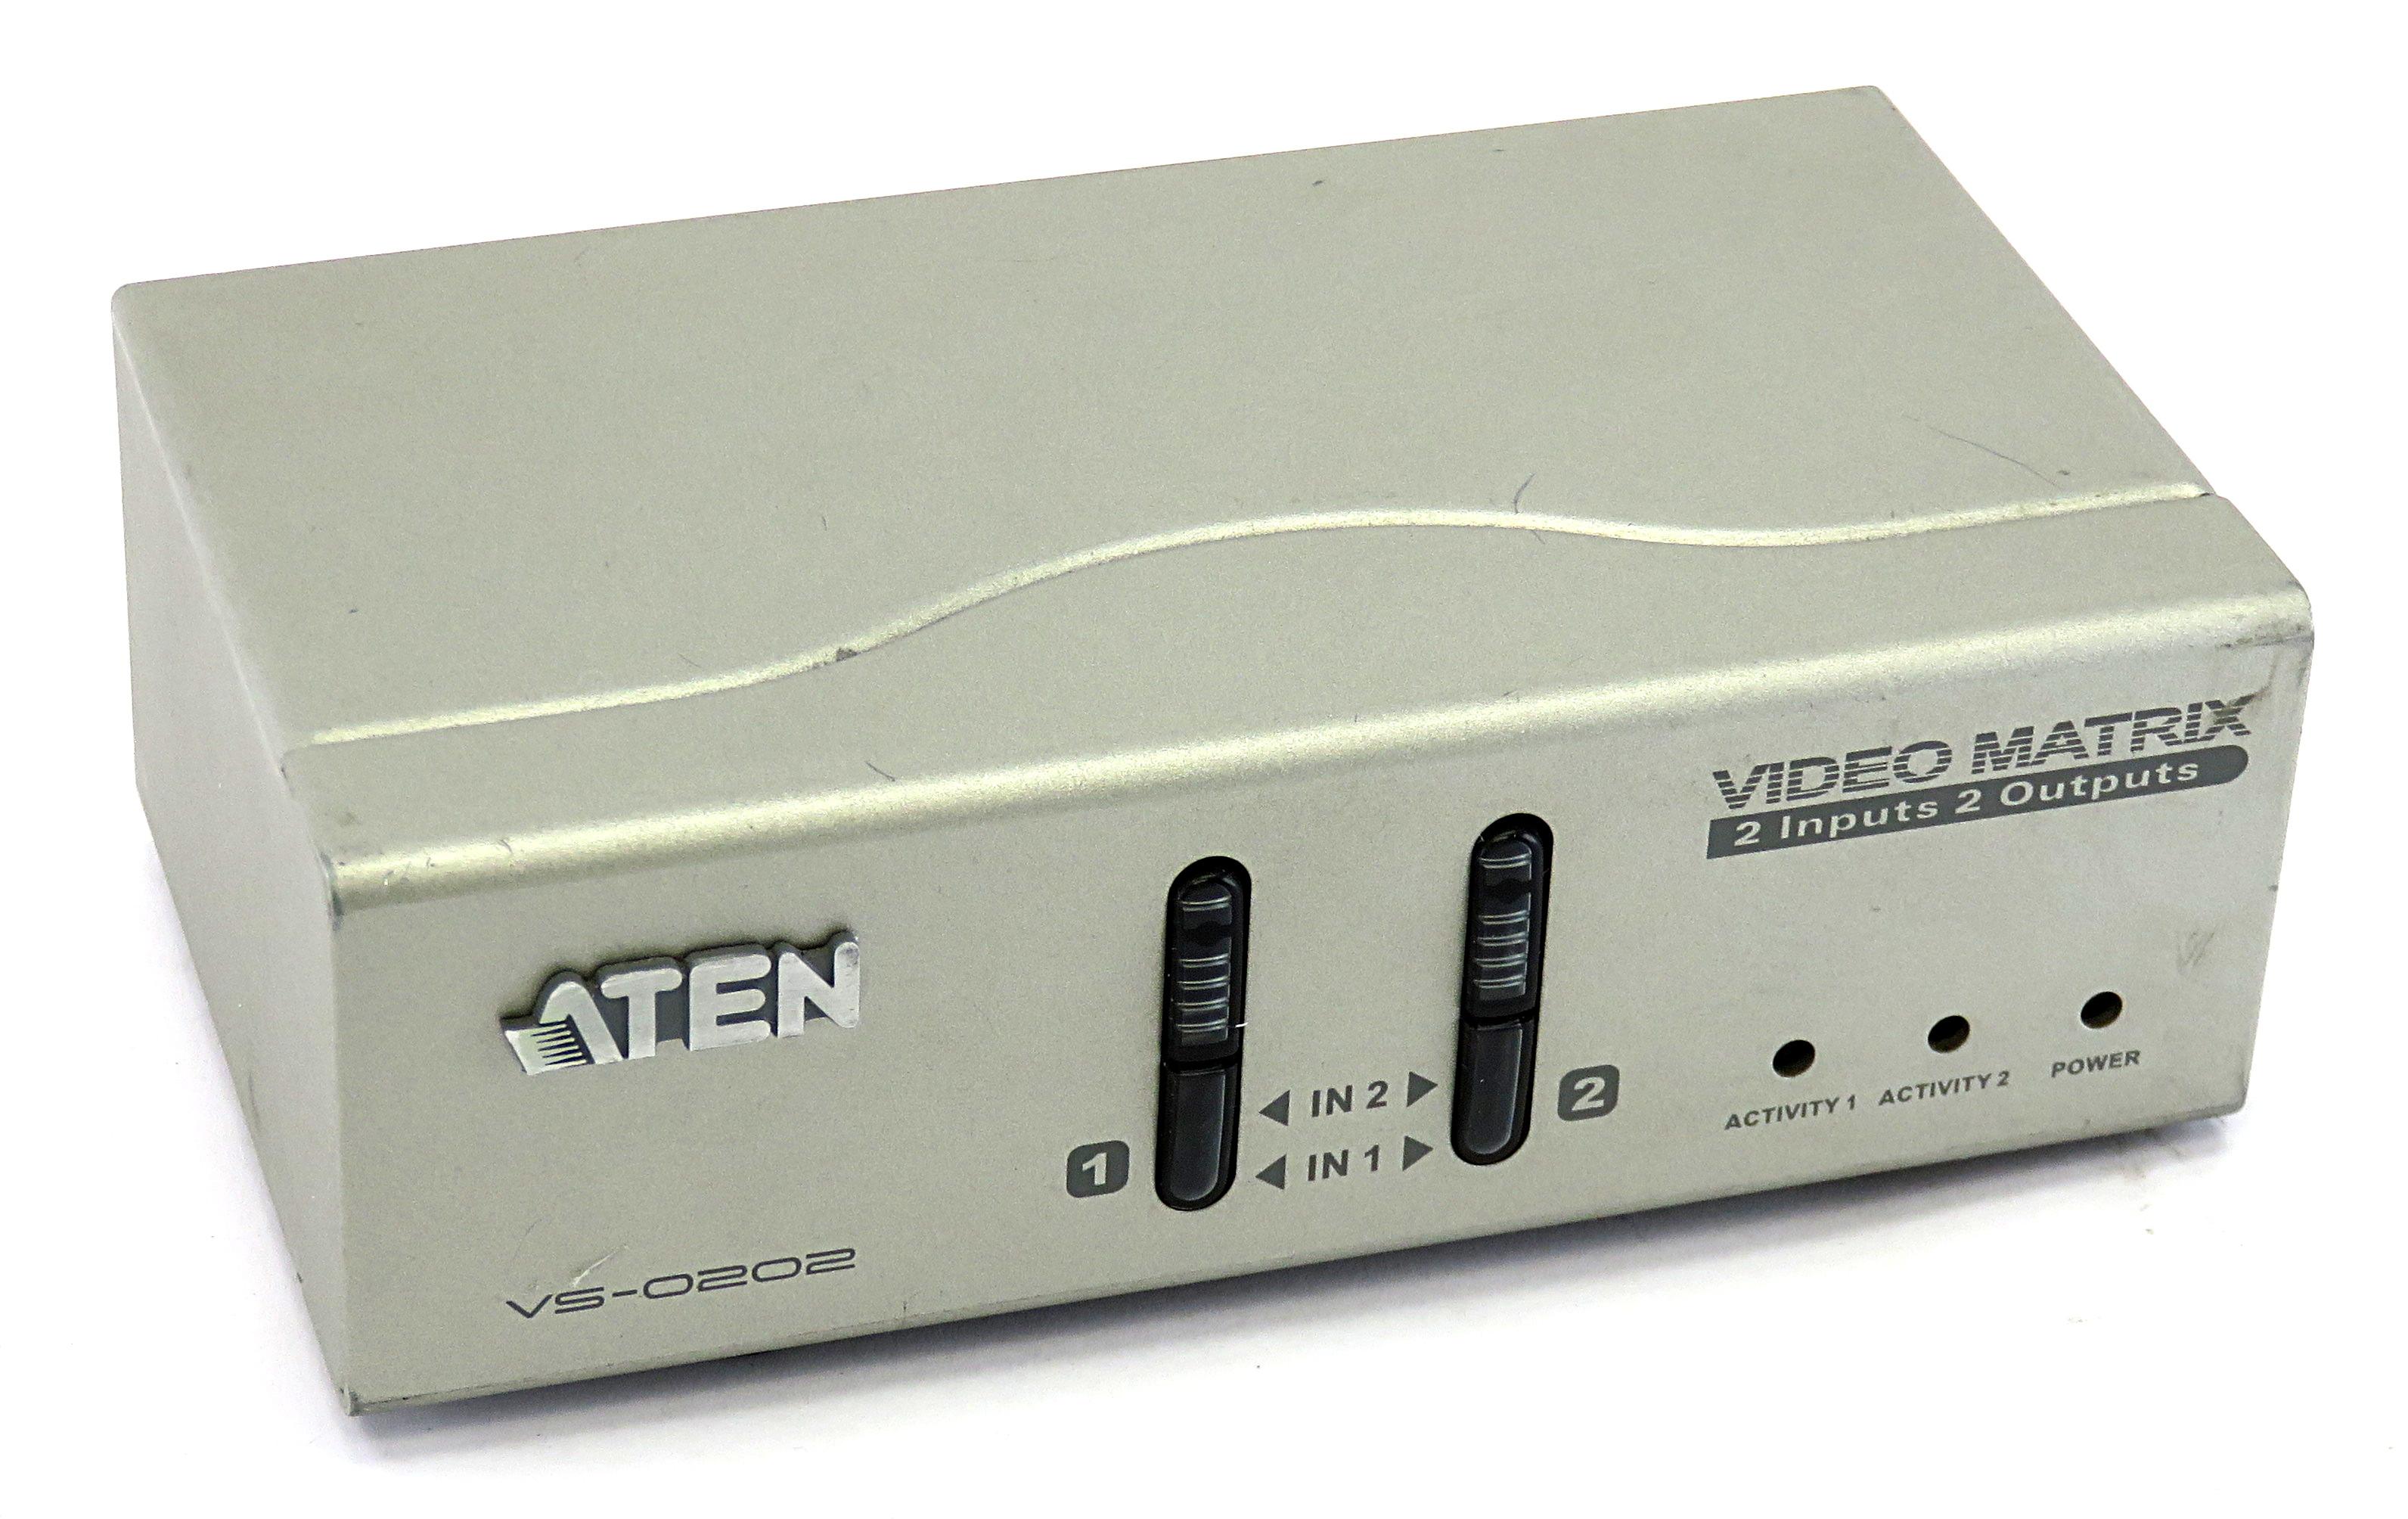 Aten VS-0202 2x2 VGA/Audio Matrix Switch